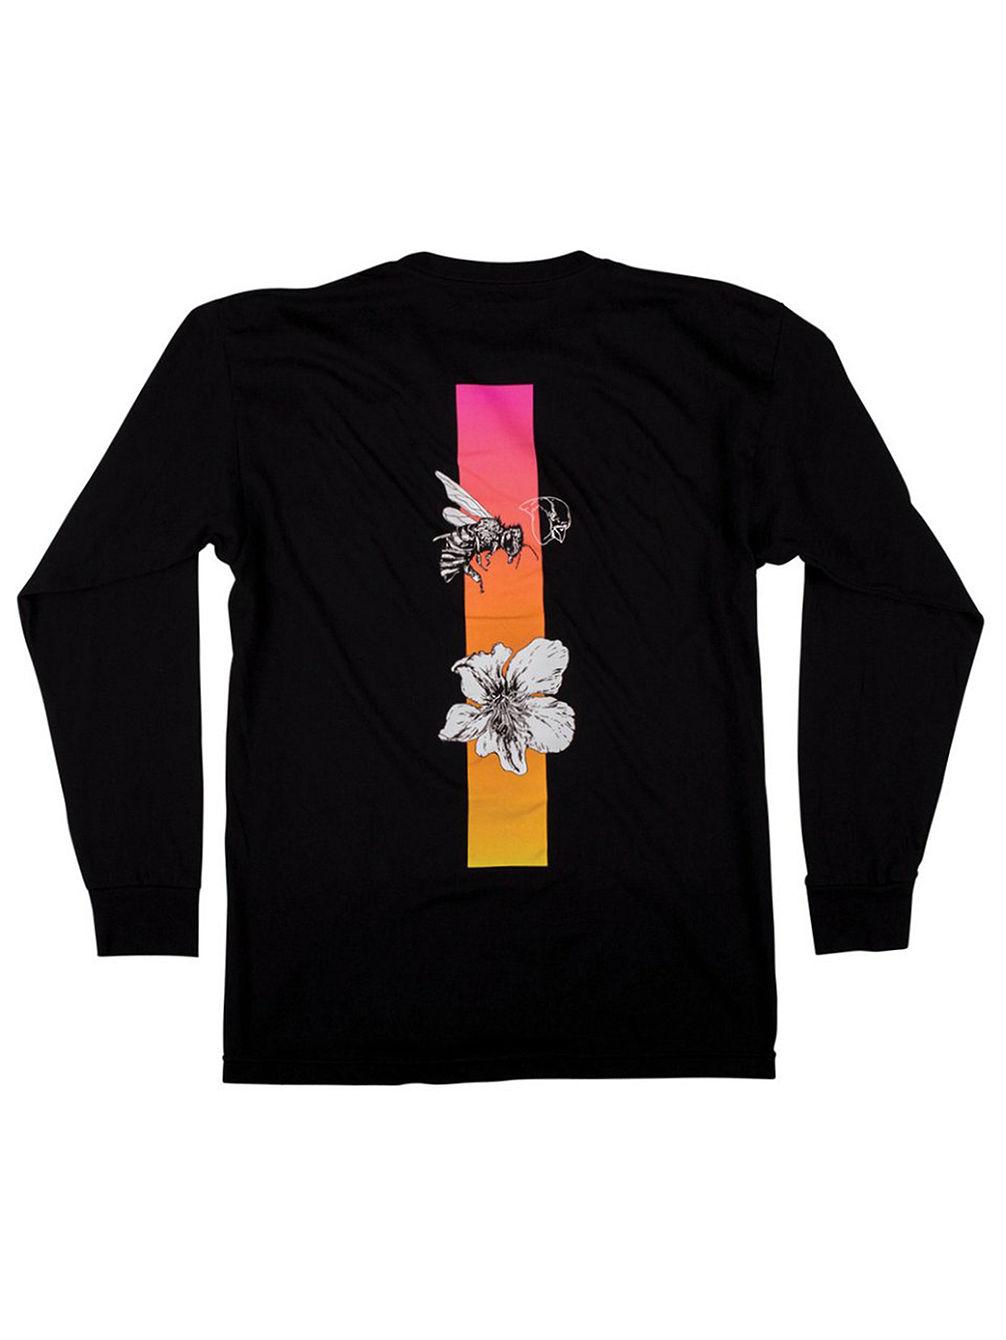 welcome-adaption-t-shirt-ls